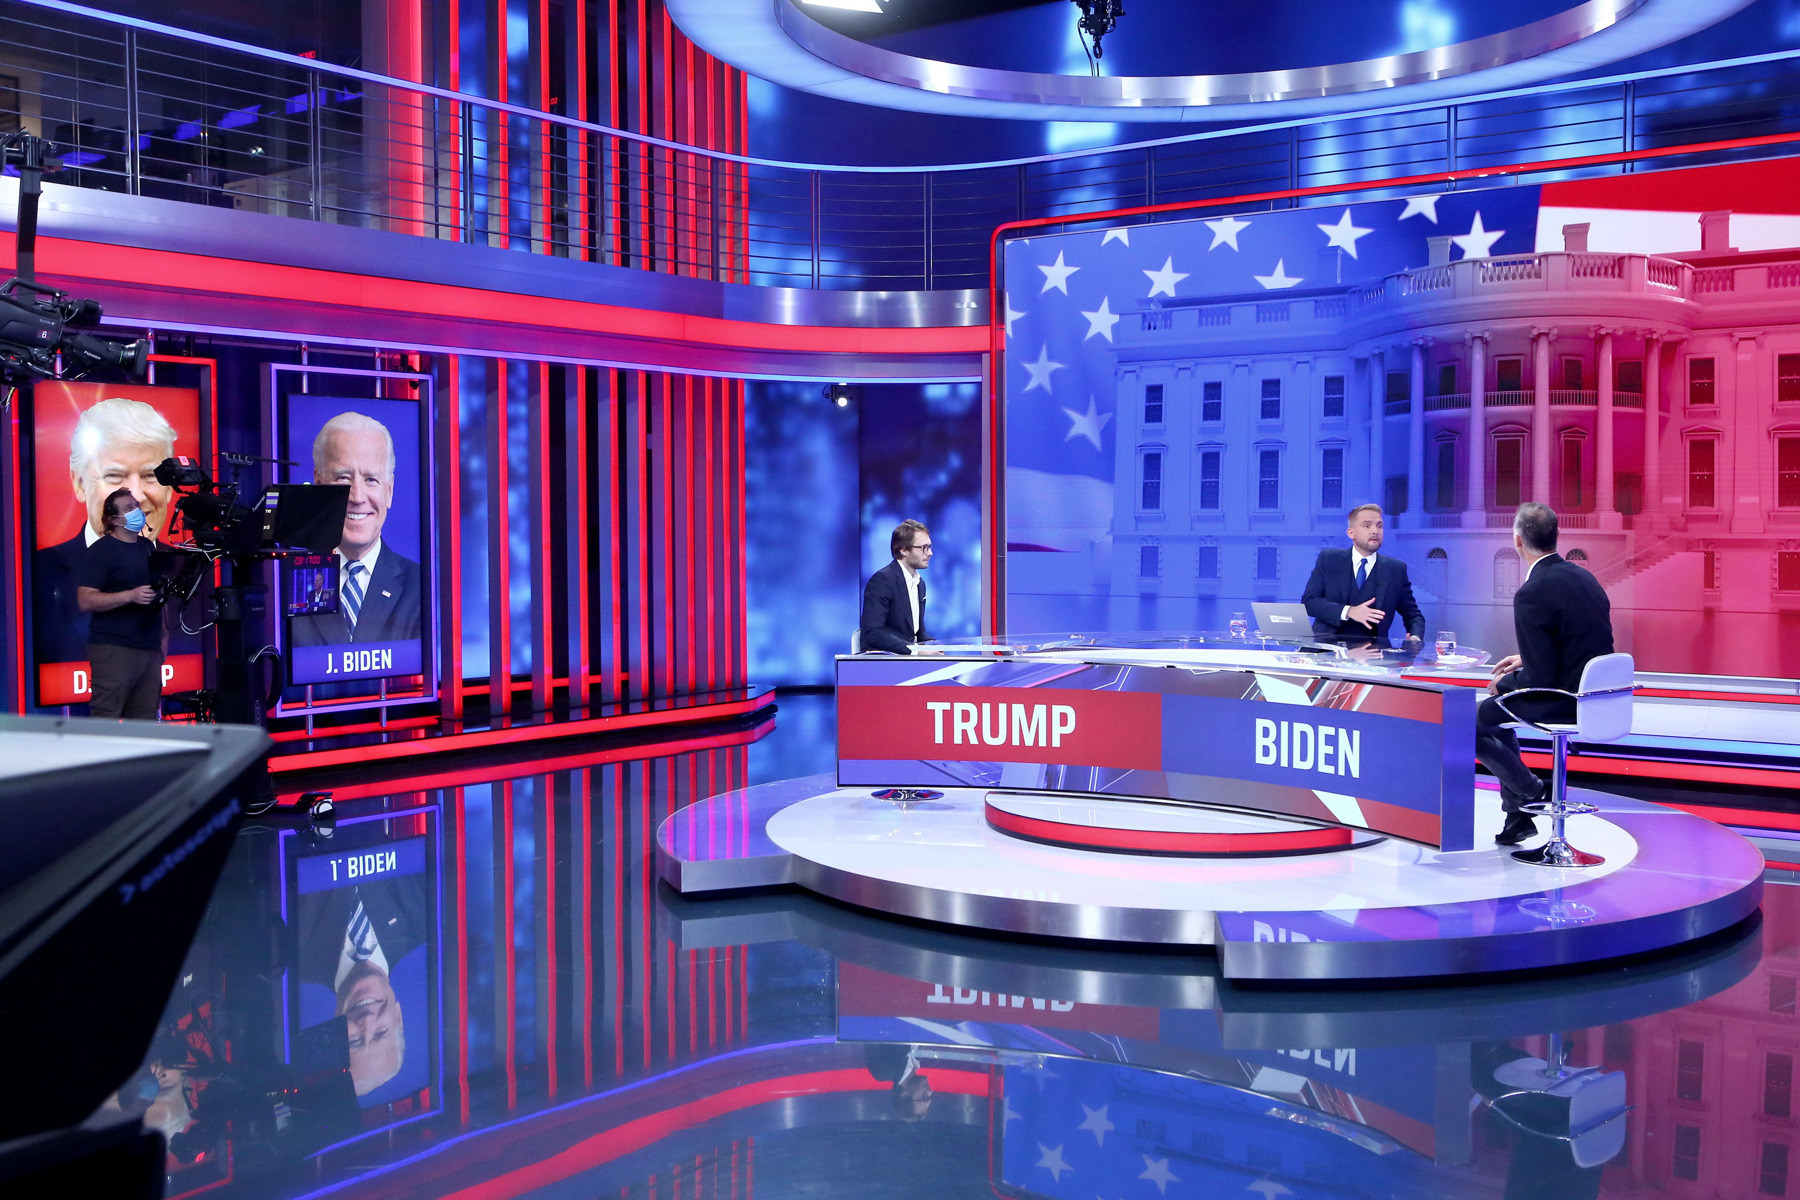 Sennheiser Digital 6000 i det mest moderne TV-studie I Tjekkiet